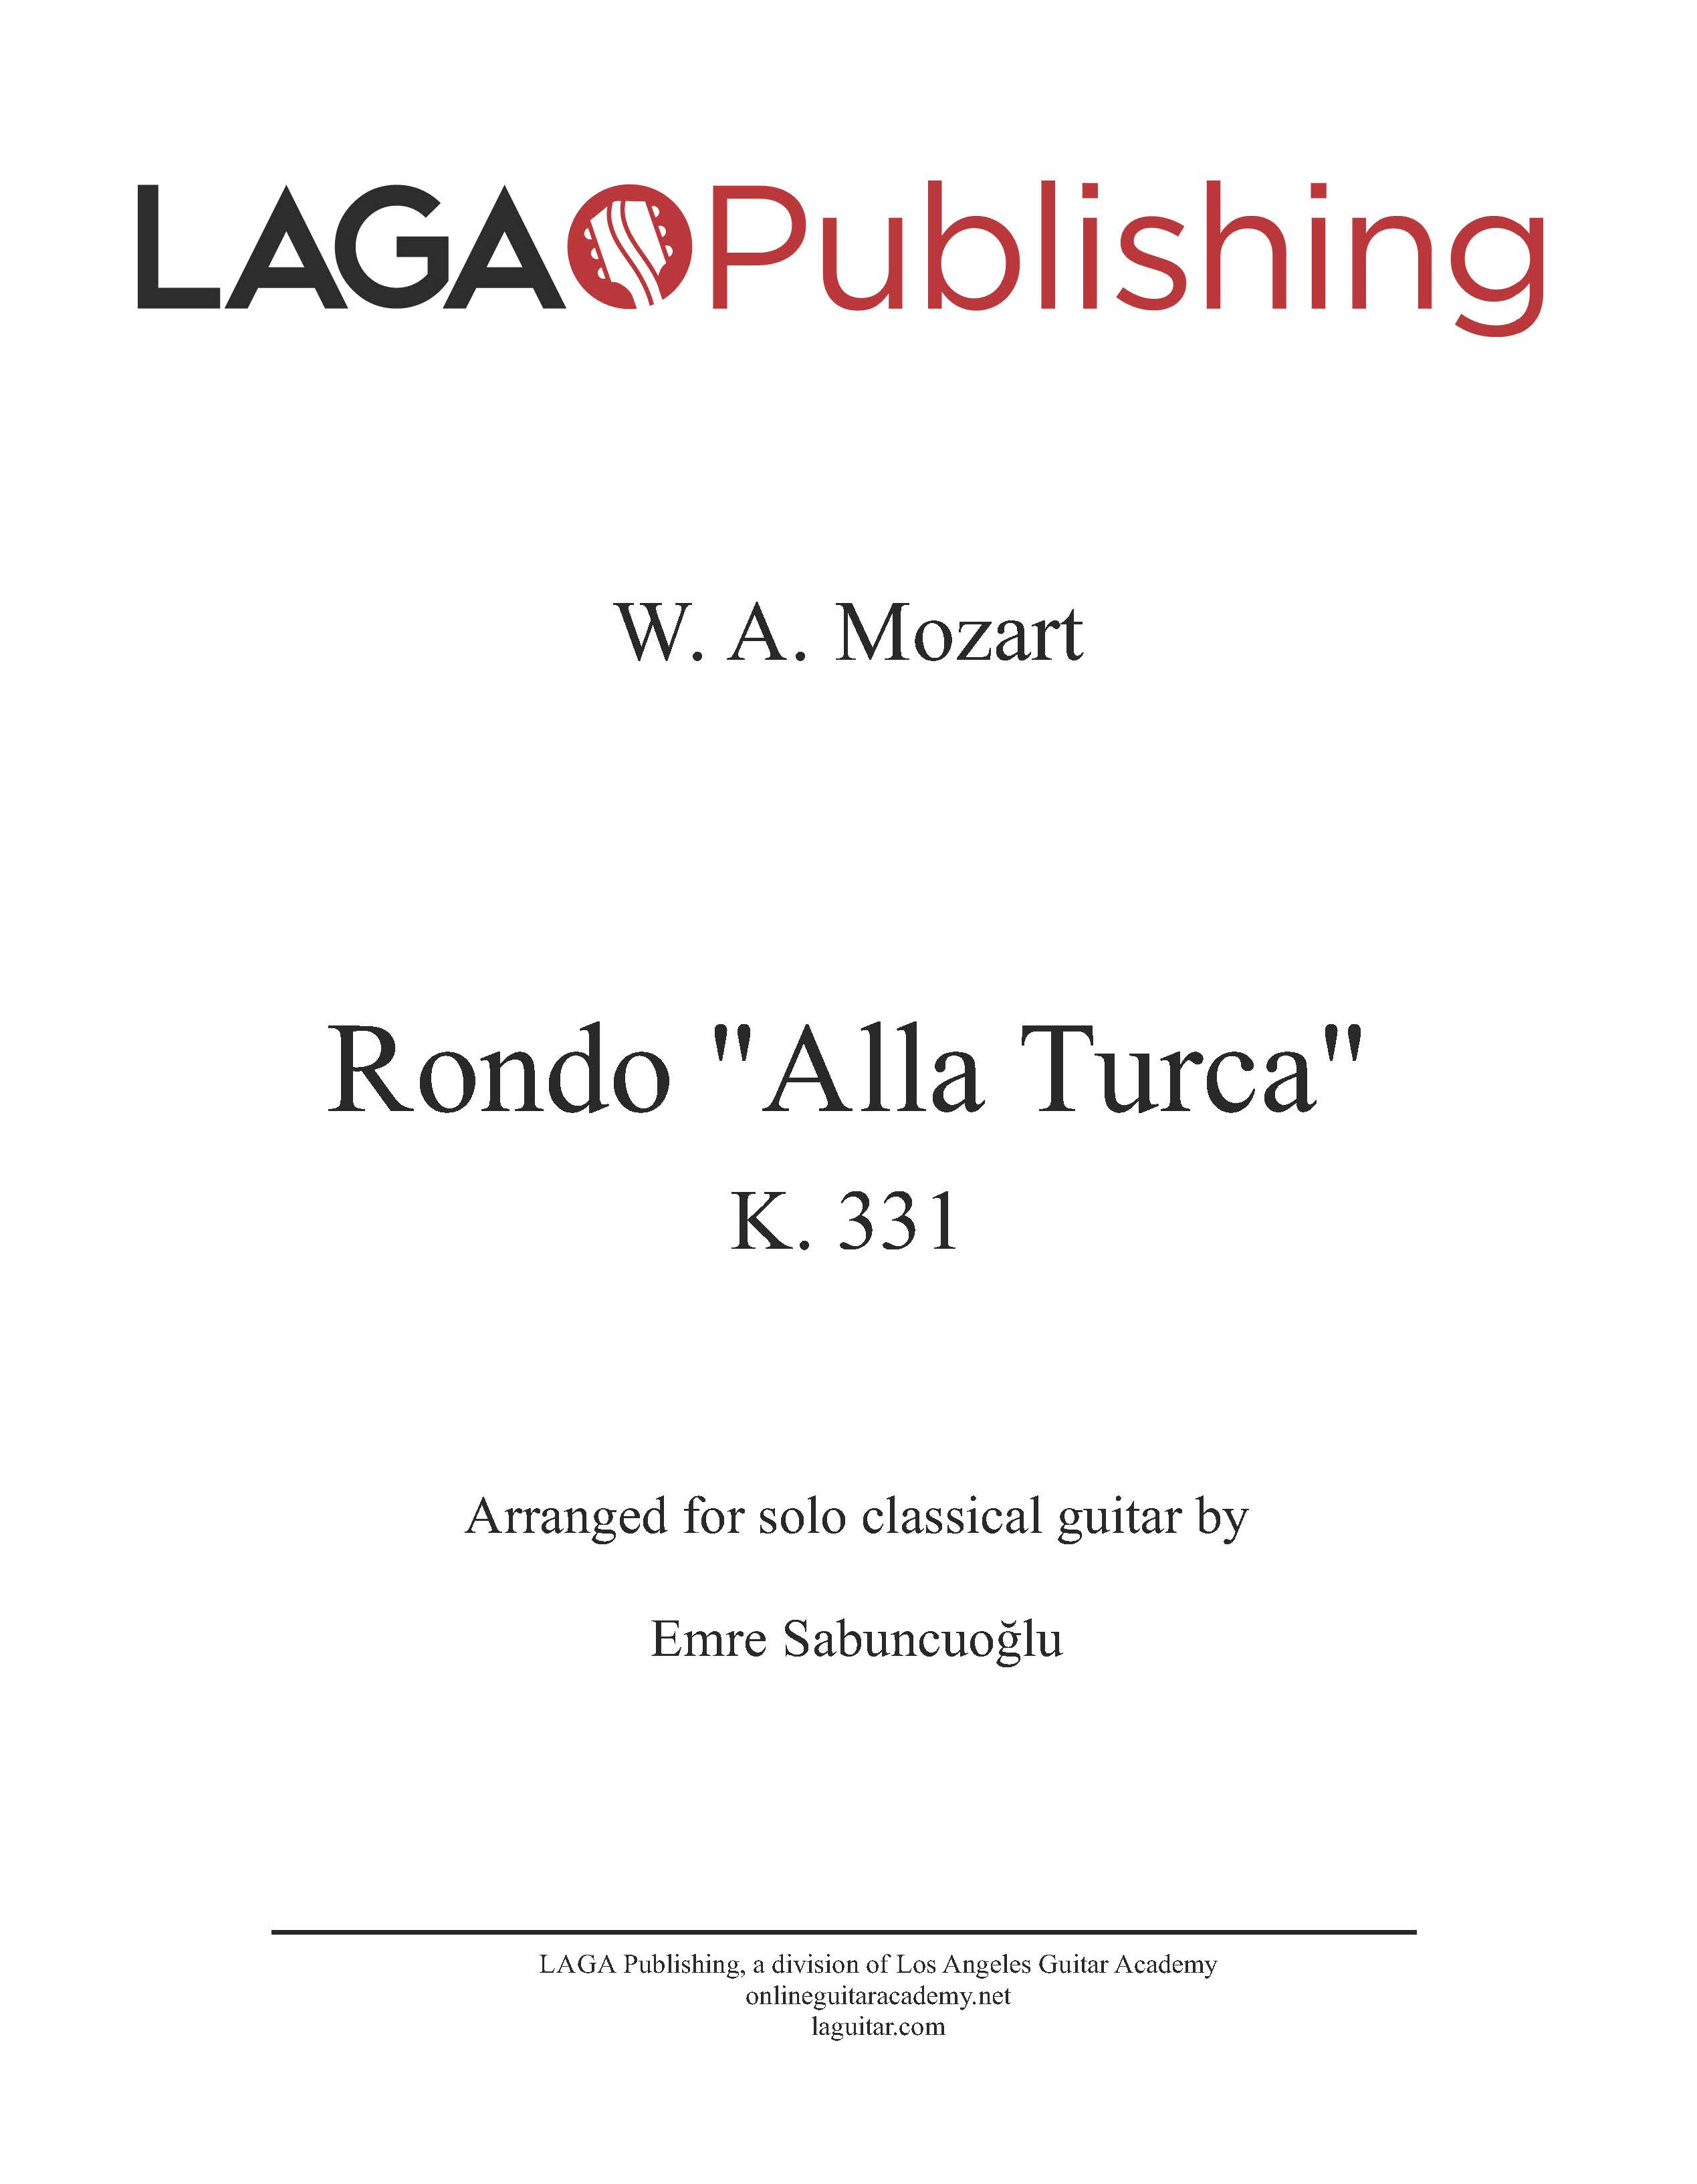 LAGA-Publishing-Mozart-Rondo-Alla-Turca-Score-and-Tab